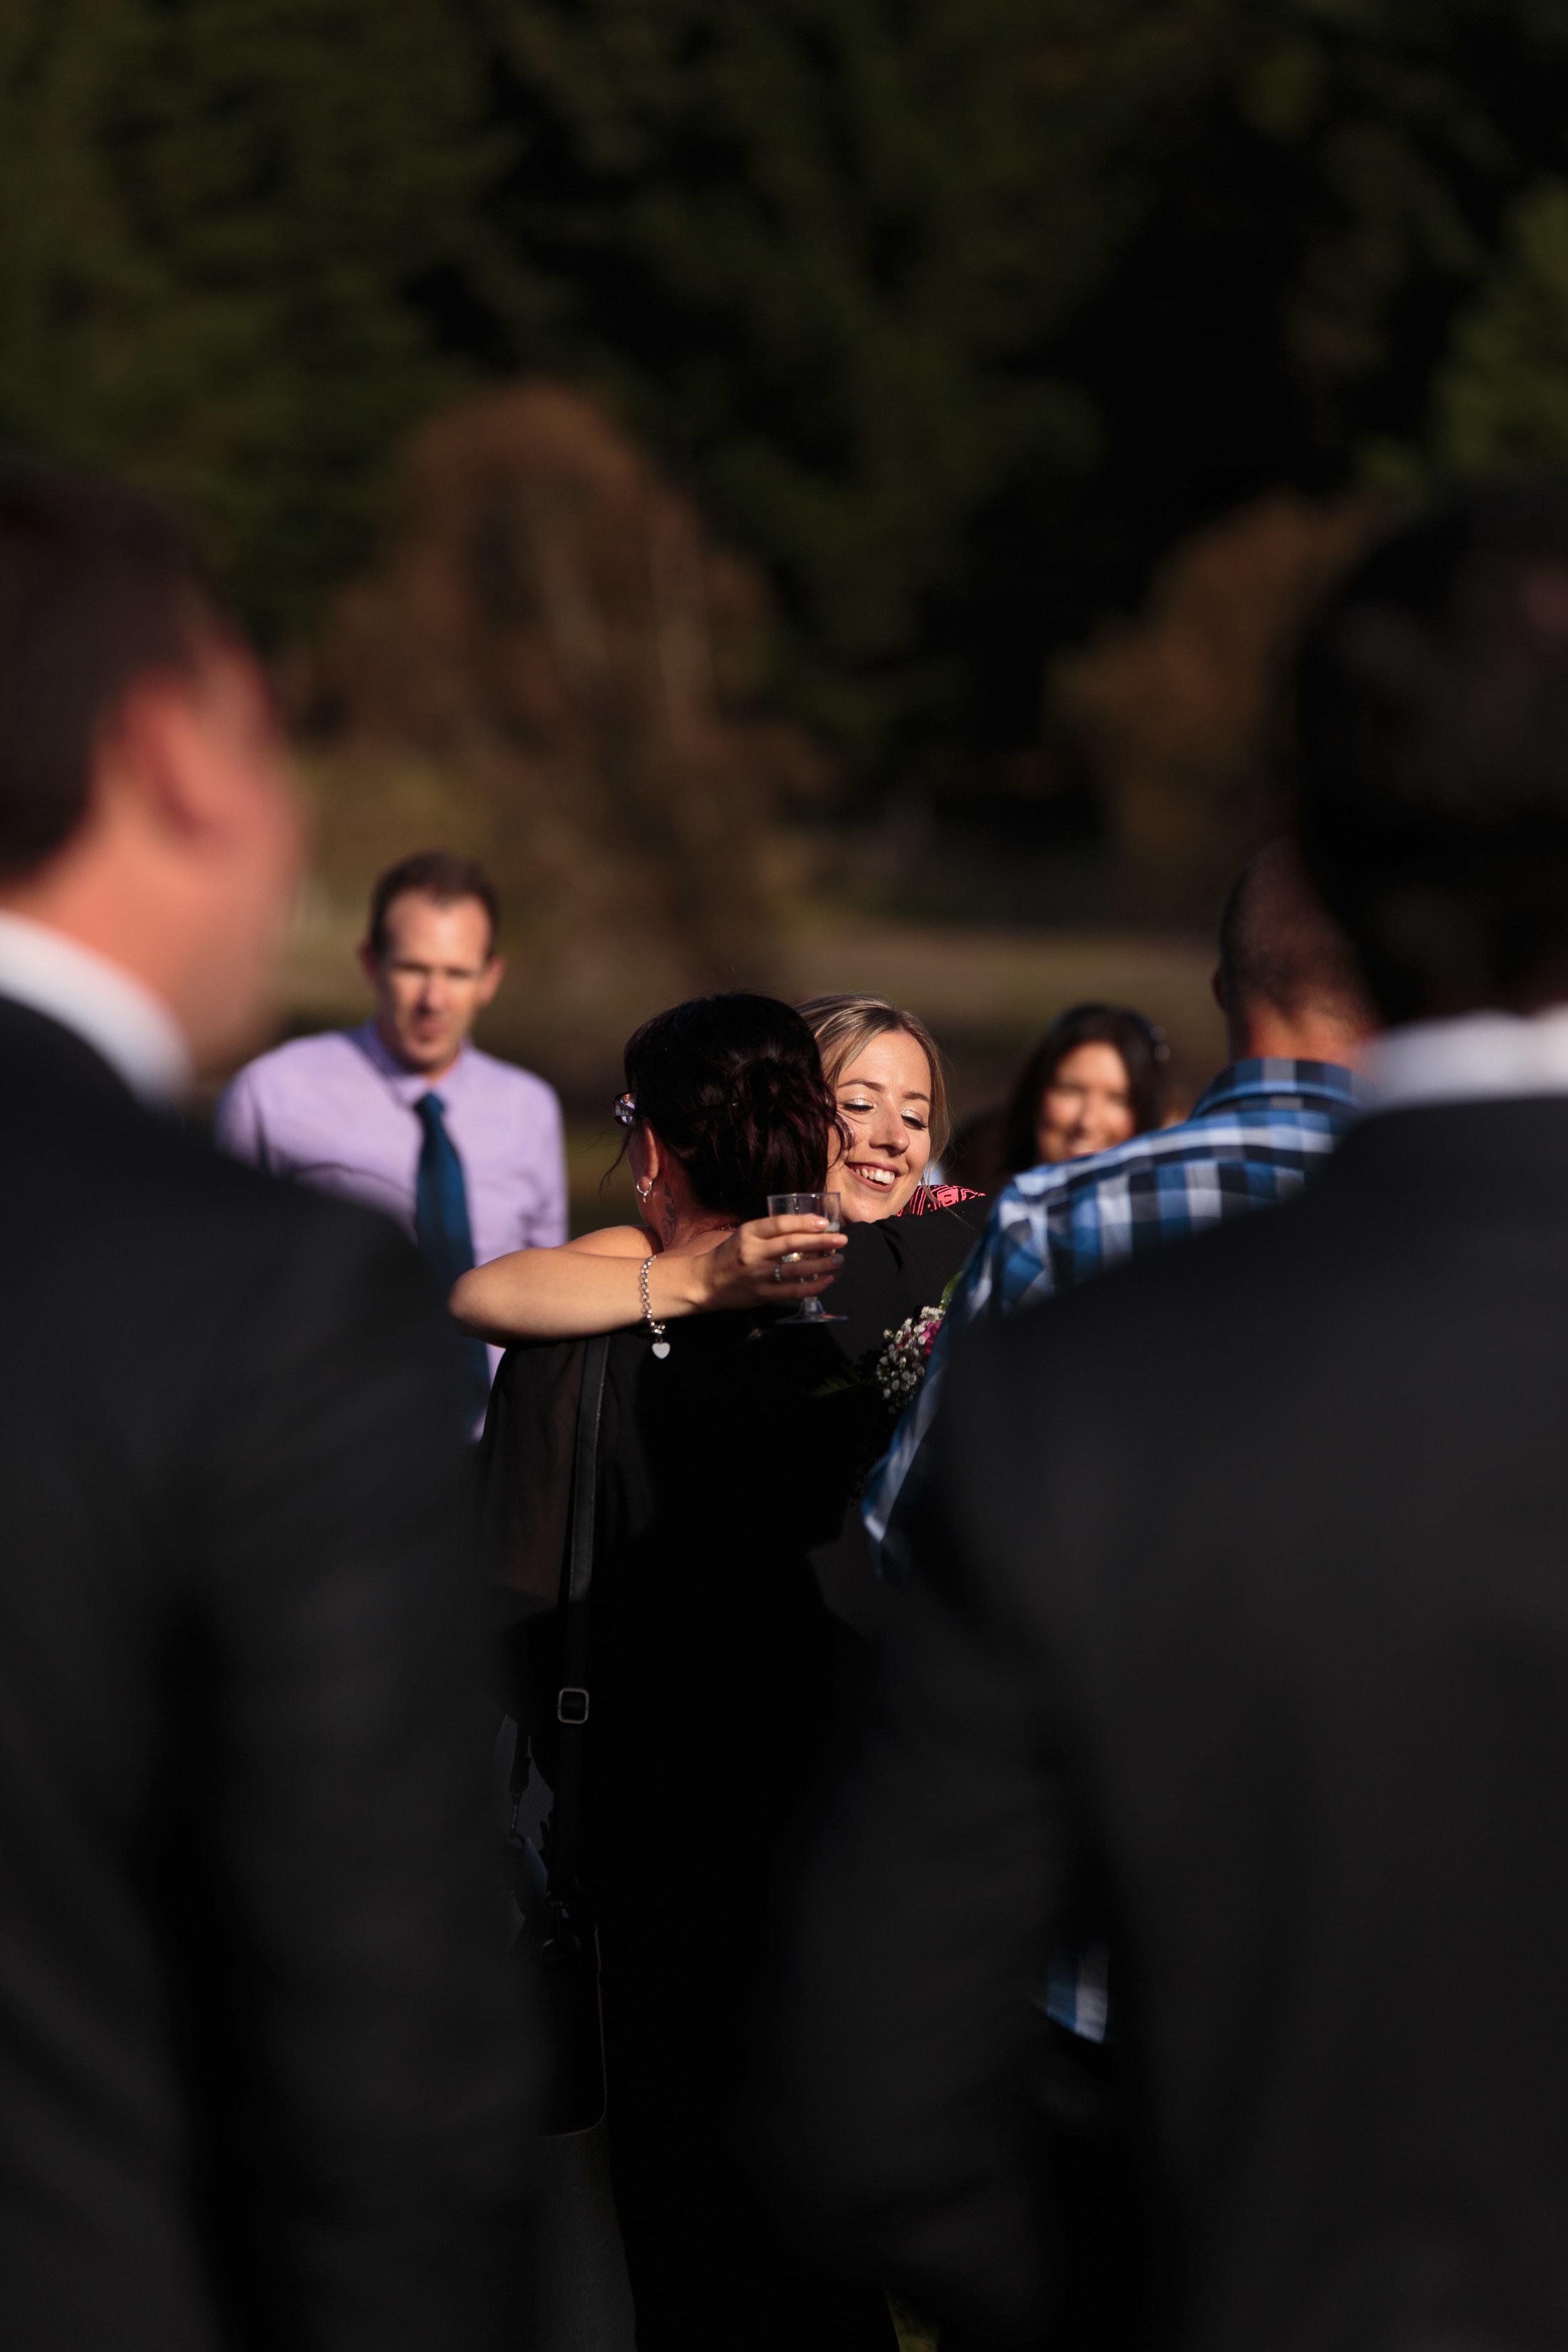 Highight-wedding-photography-dudding-lake-palmerston-north-new-zealand-45.jpg